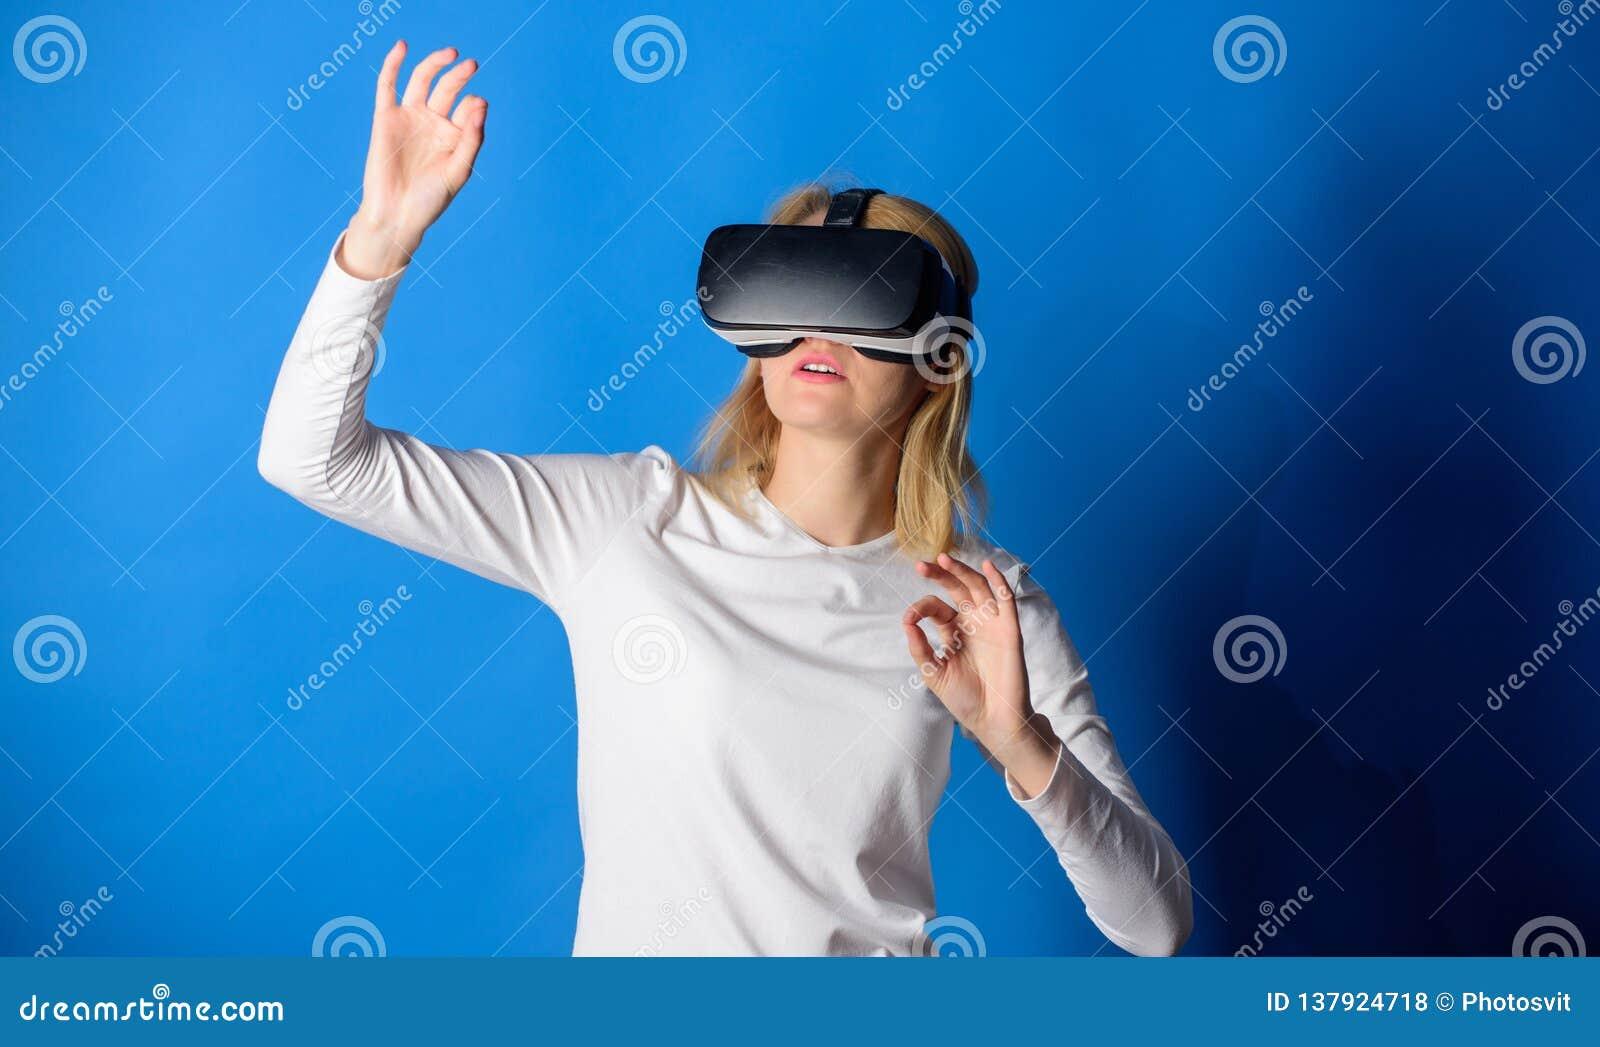 Beautiful woman wearing virtual reality goggles in studio. Woman using virtual reality headset. Happy woman exploring